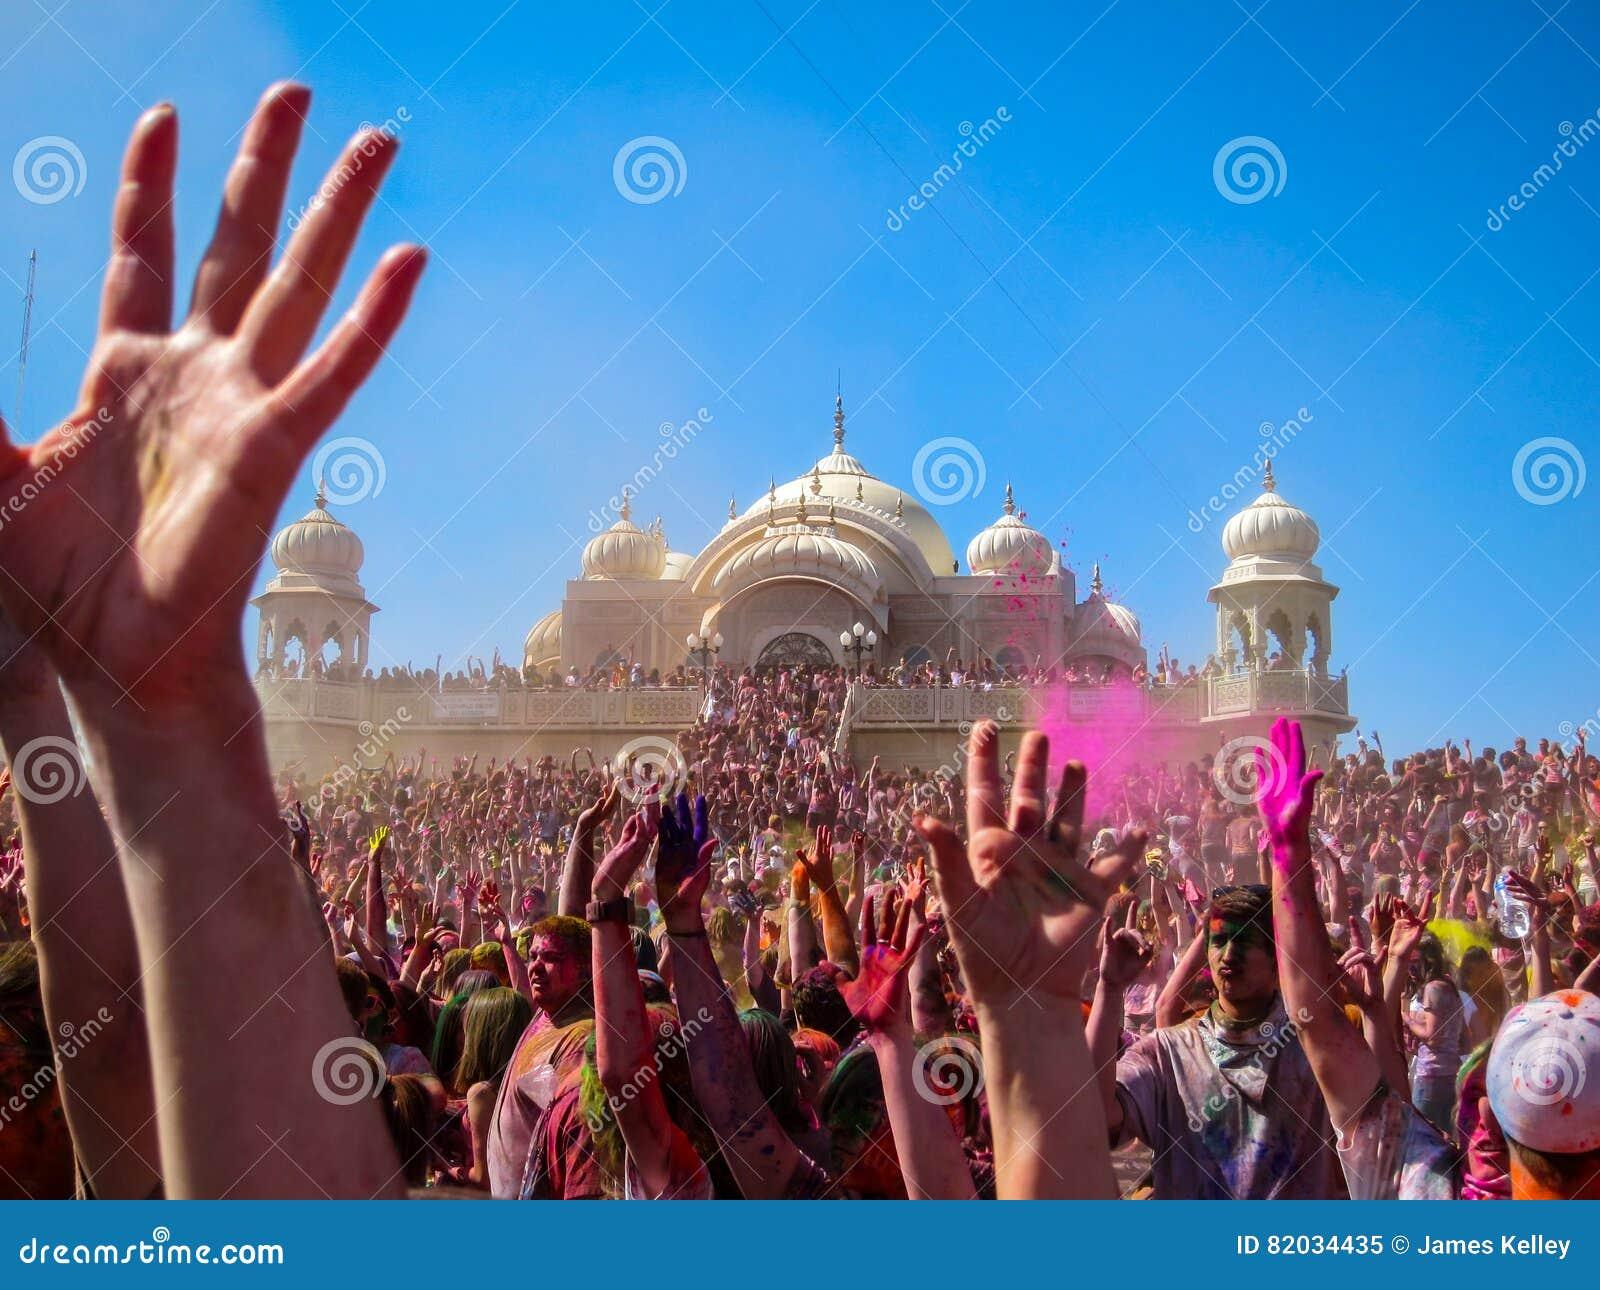 Holi Festival von Farben